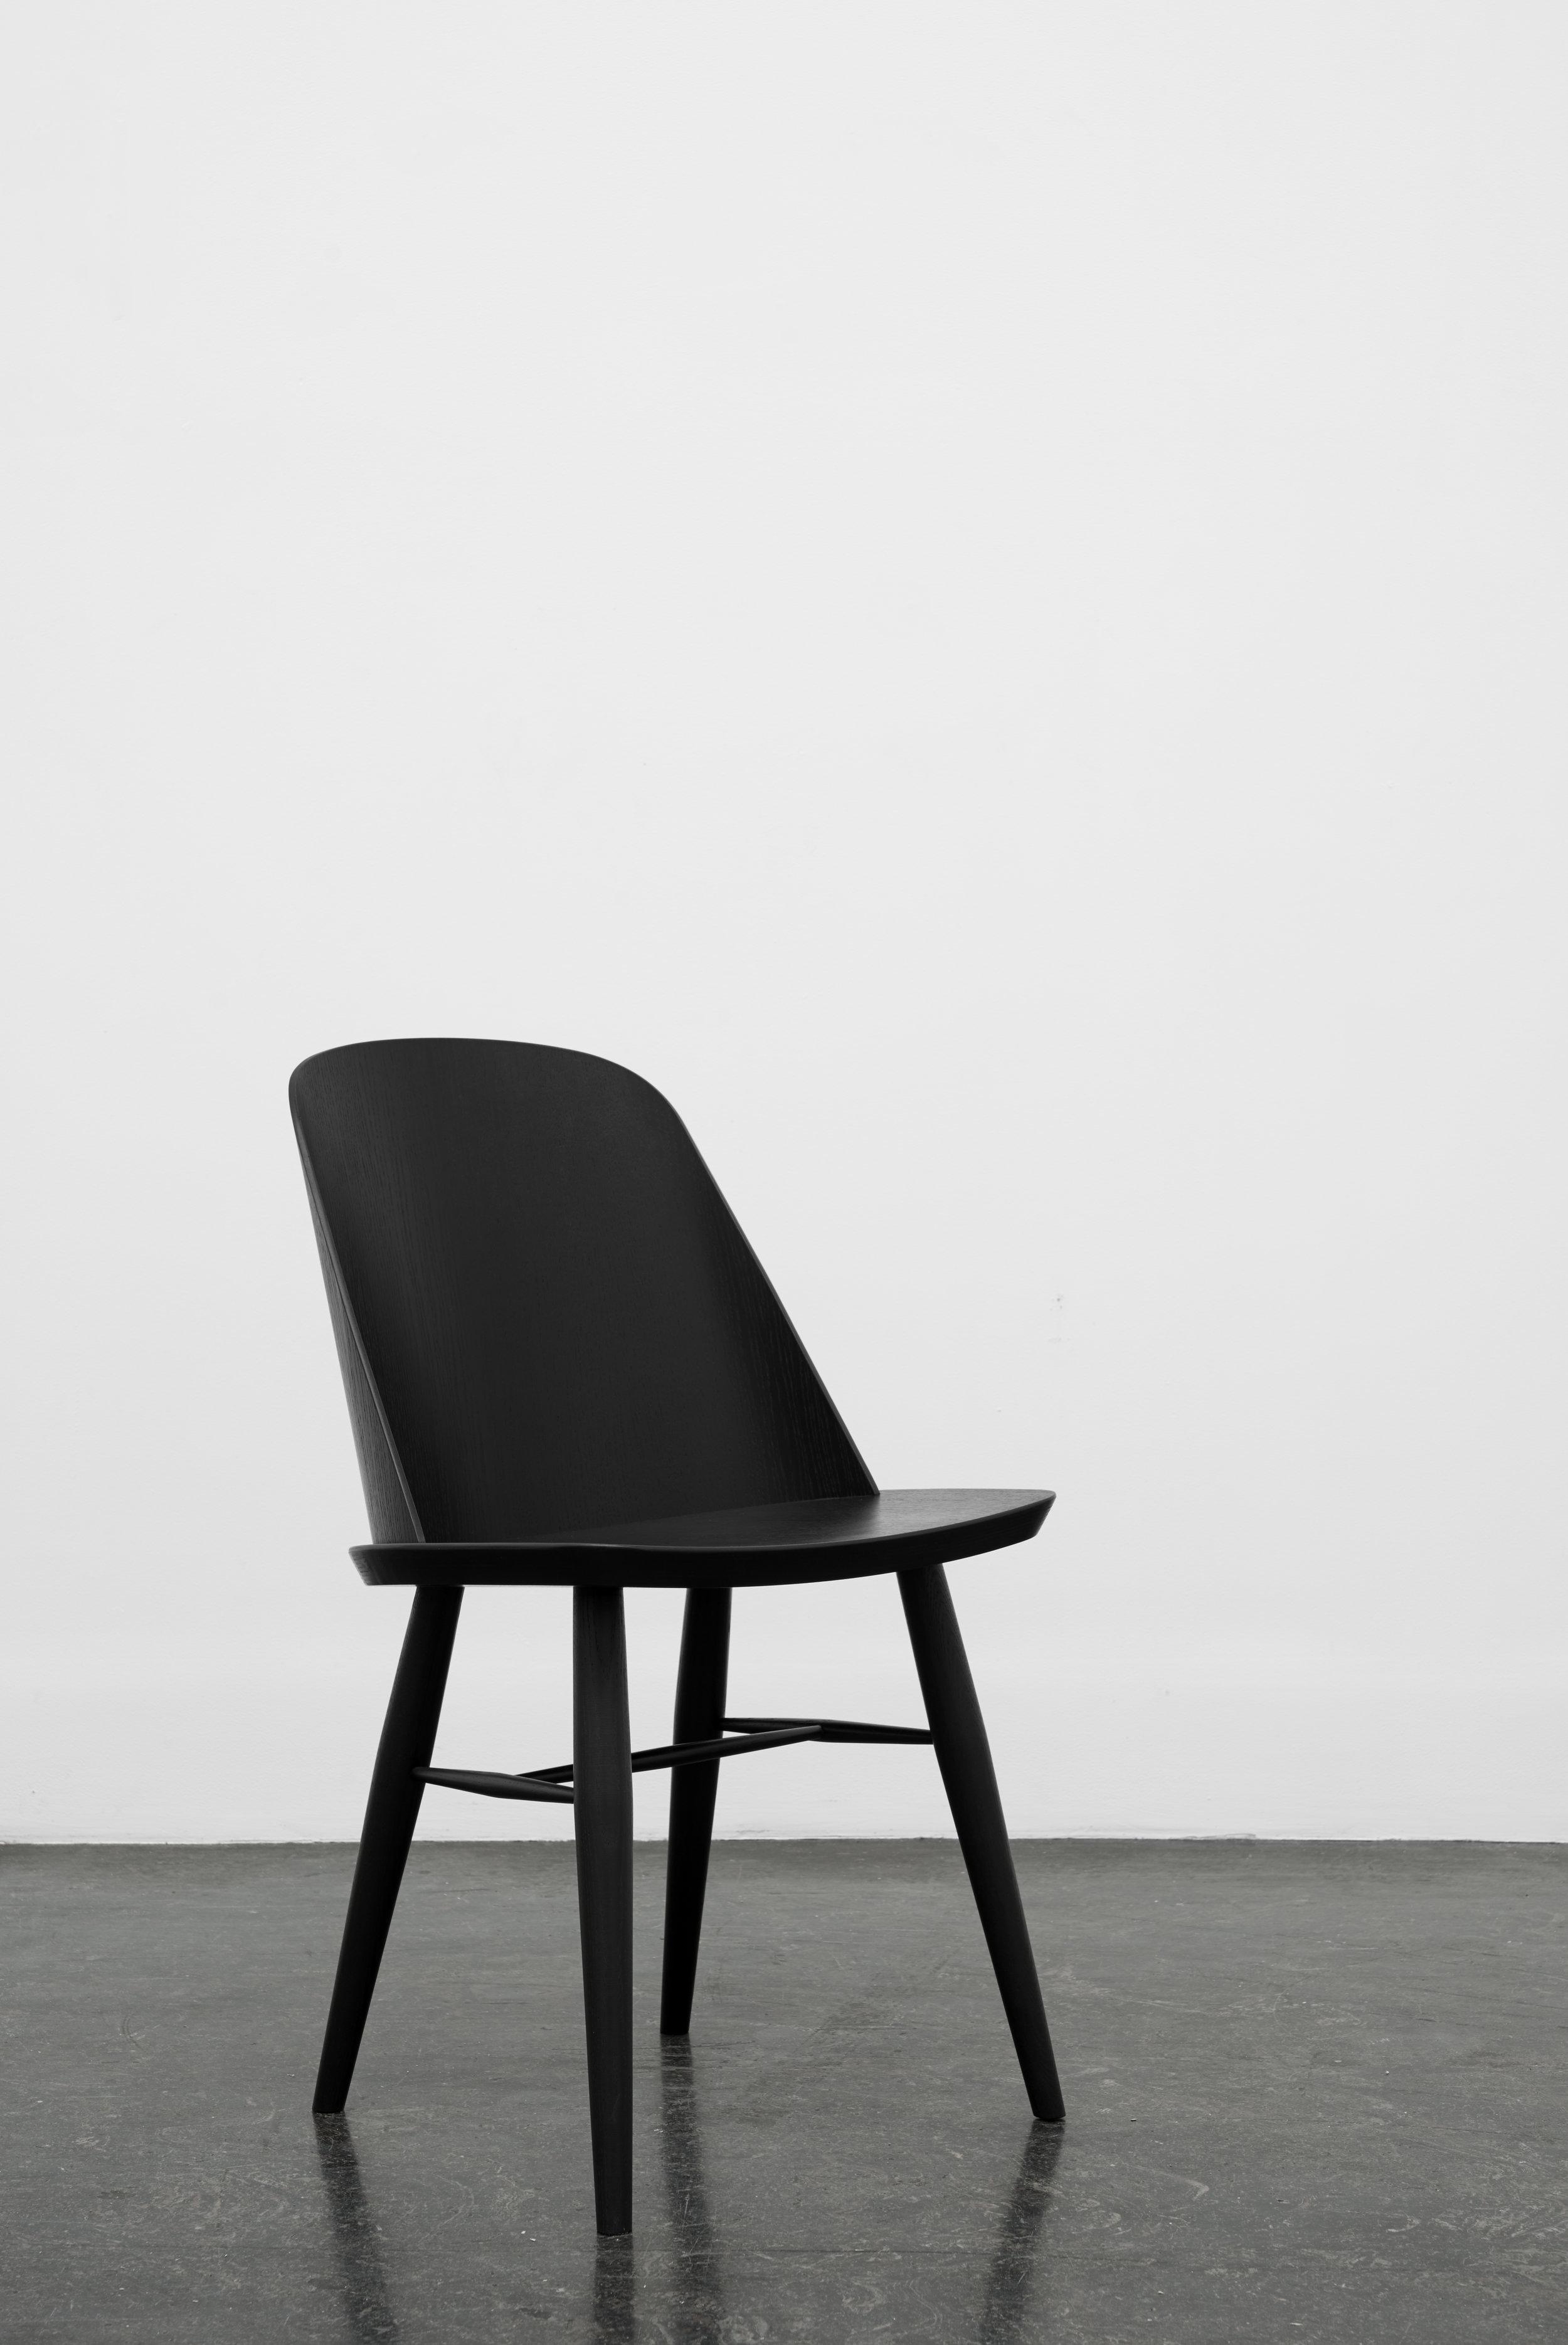 synnes-chair-2015-falke-svatun(5)